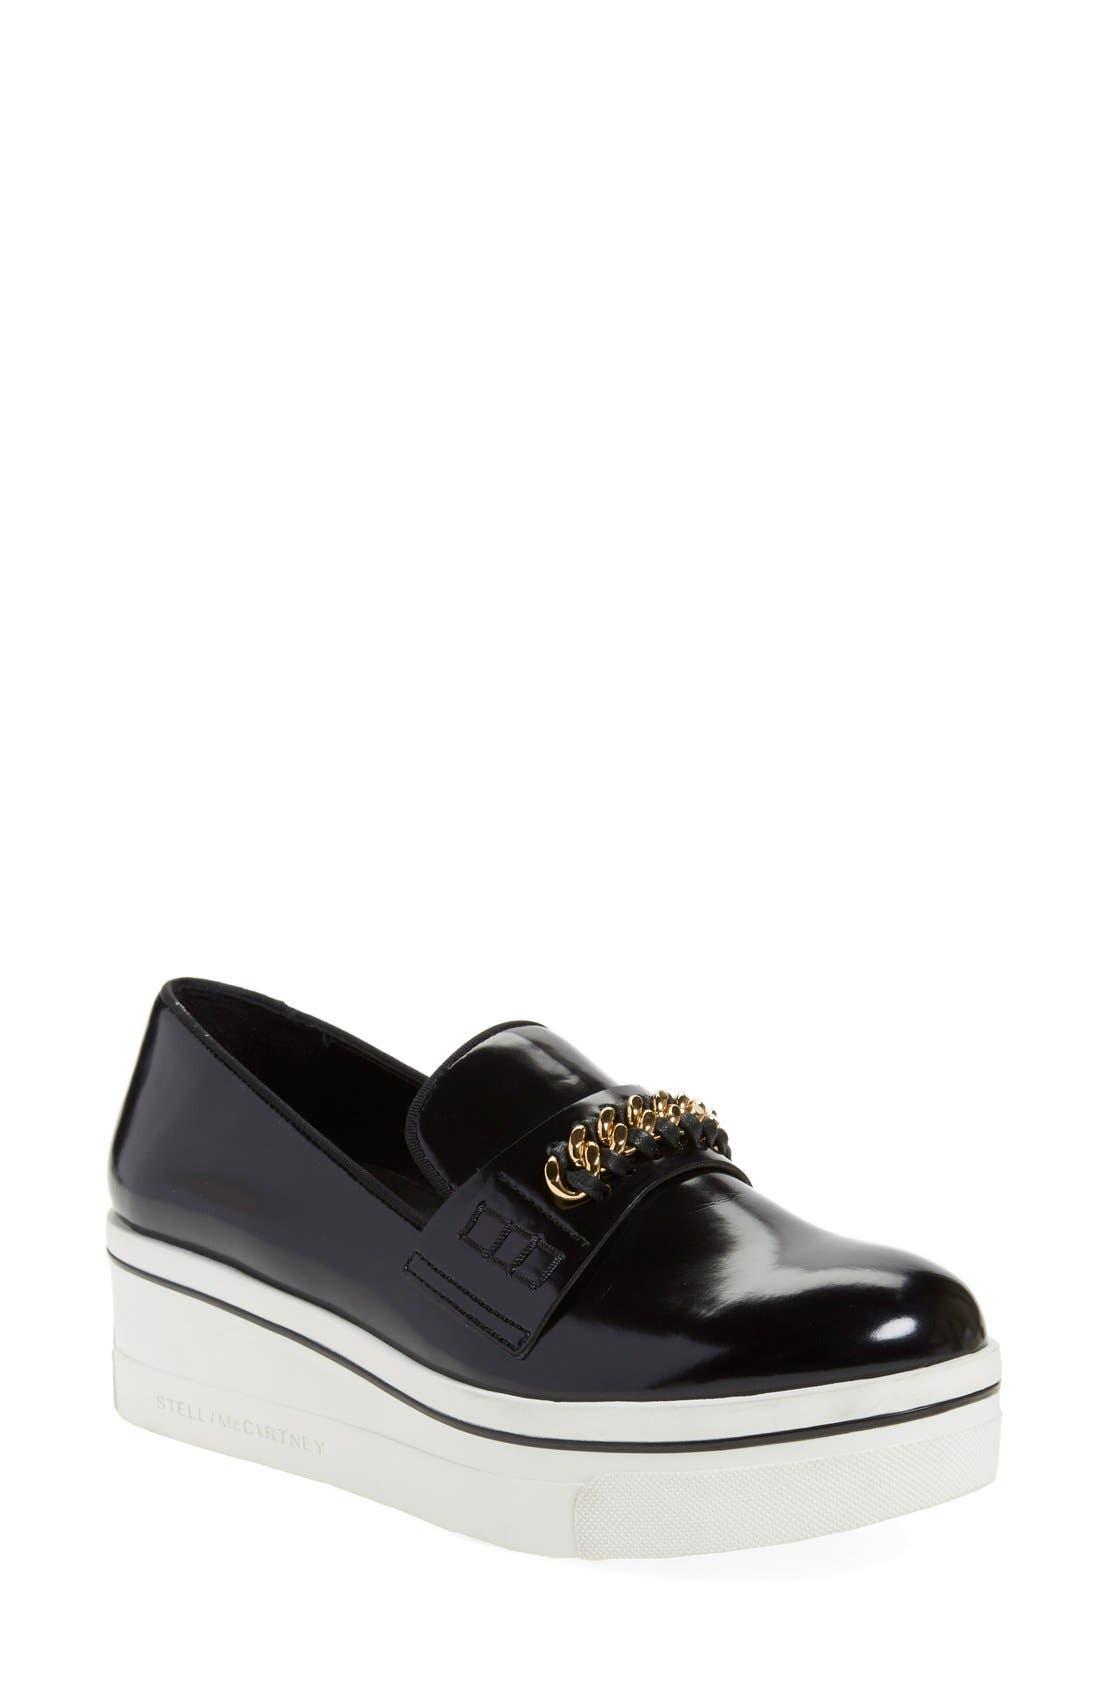 'Binx' Slip-On Platform Sneaker,                         Main,                         color, 001